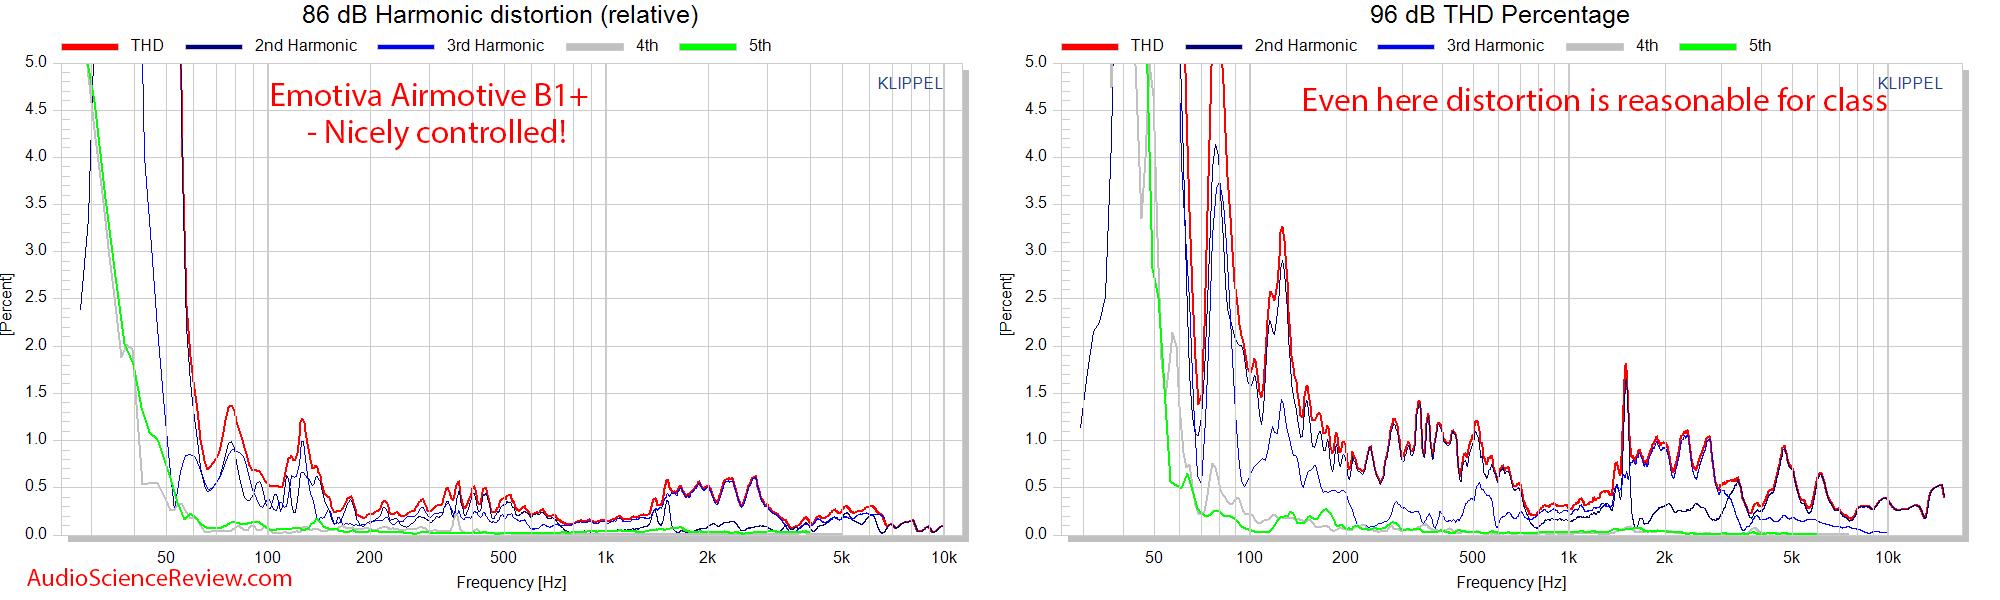 Emotiva Airmotiv B1+ distortion measurements.png